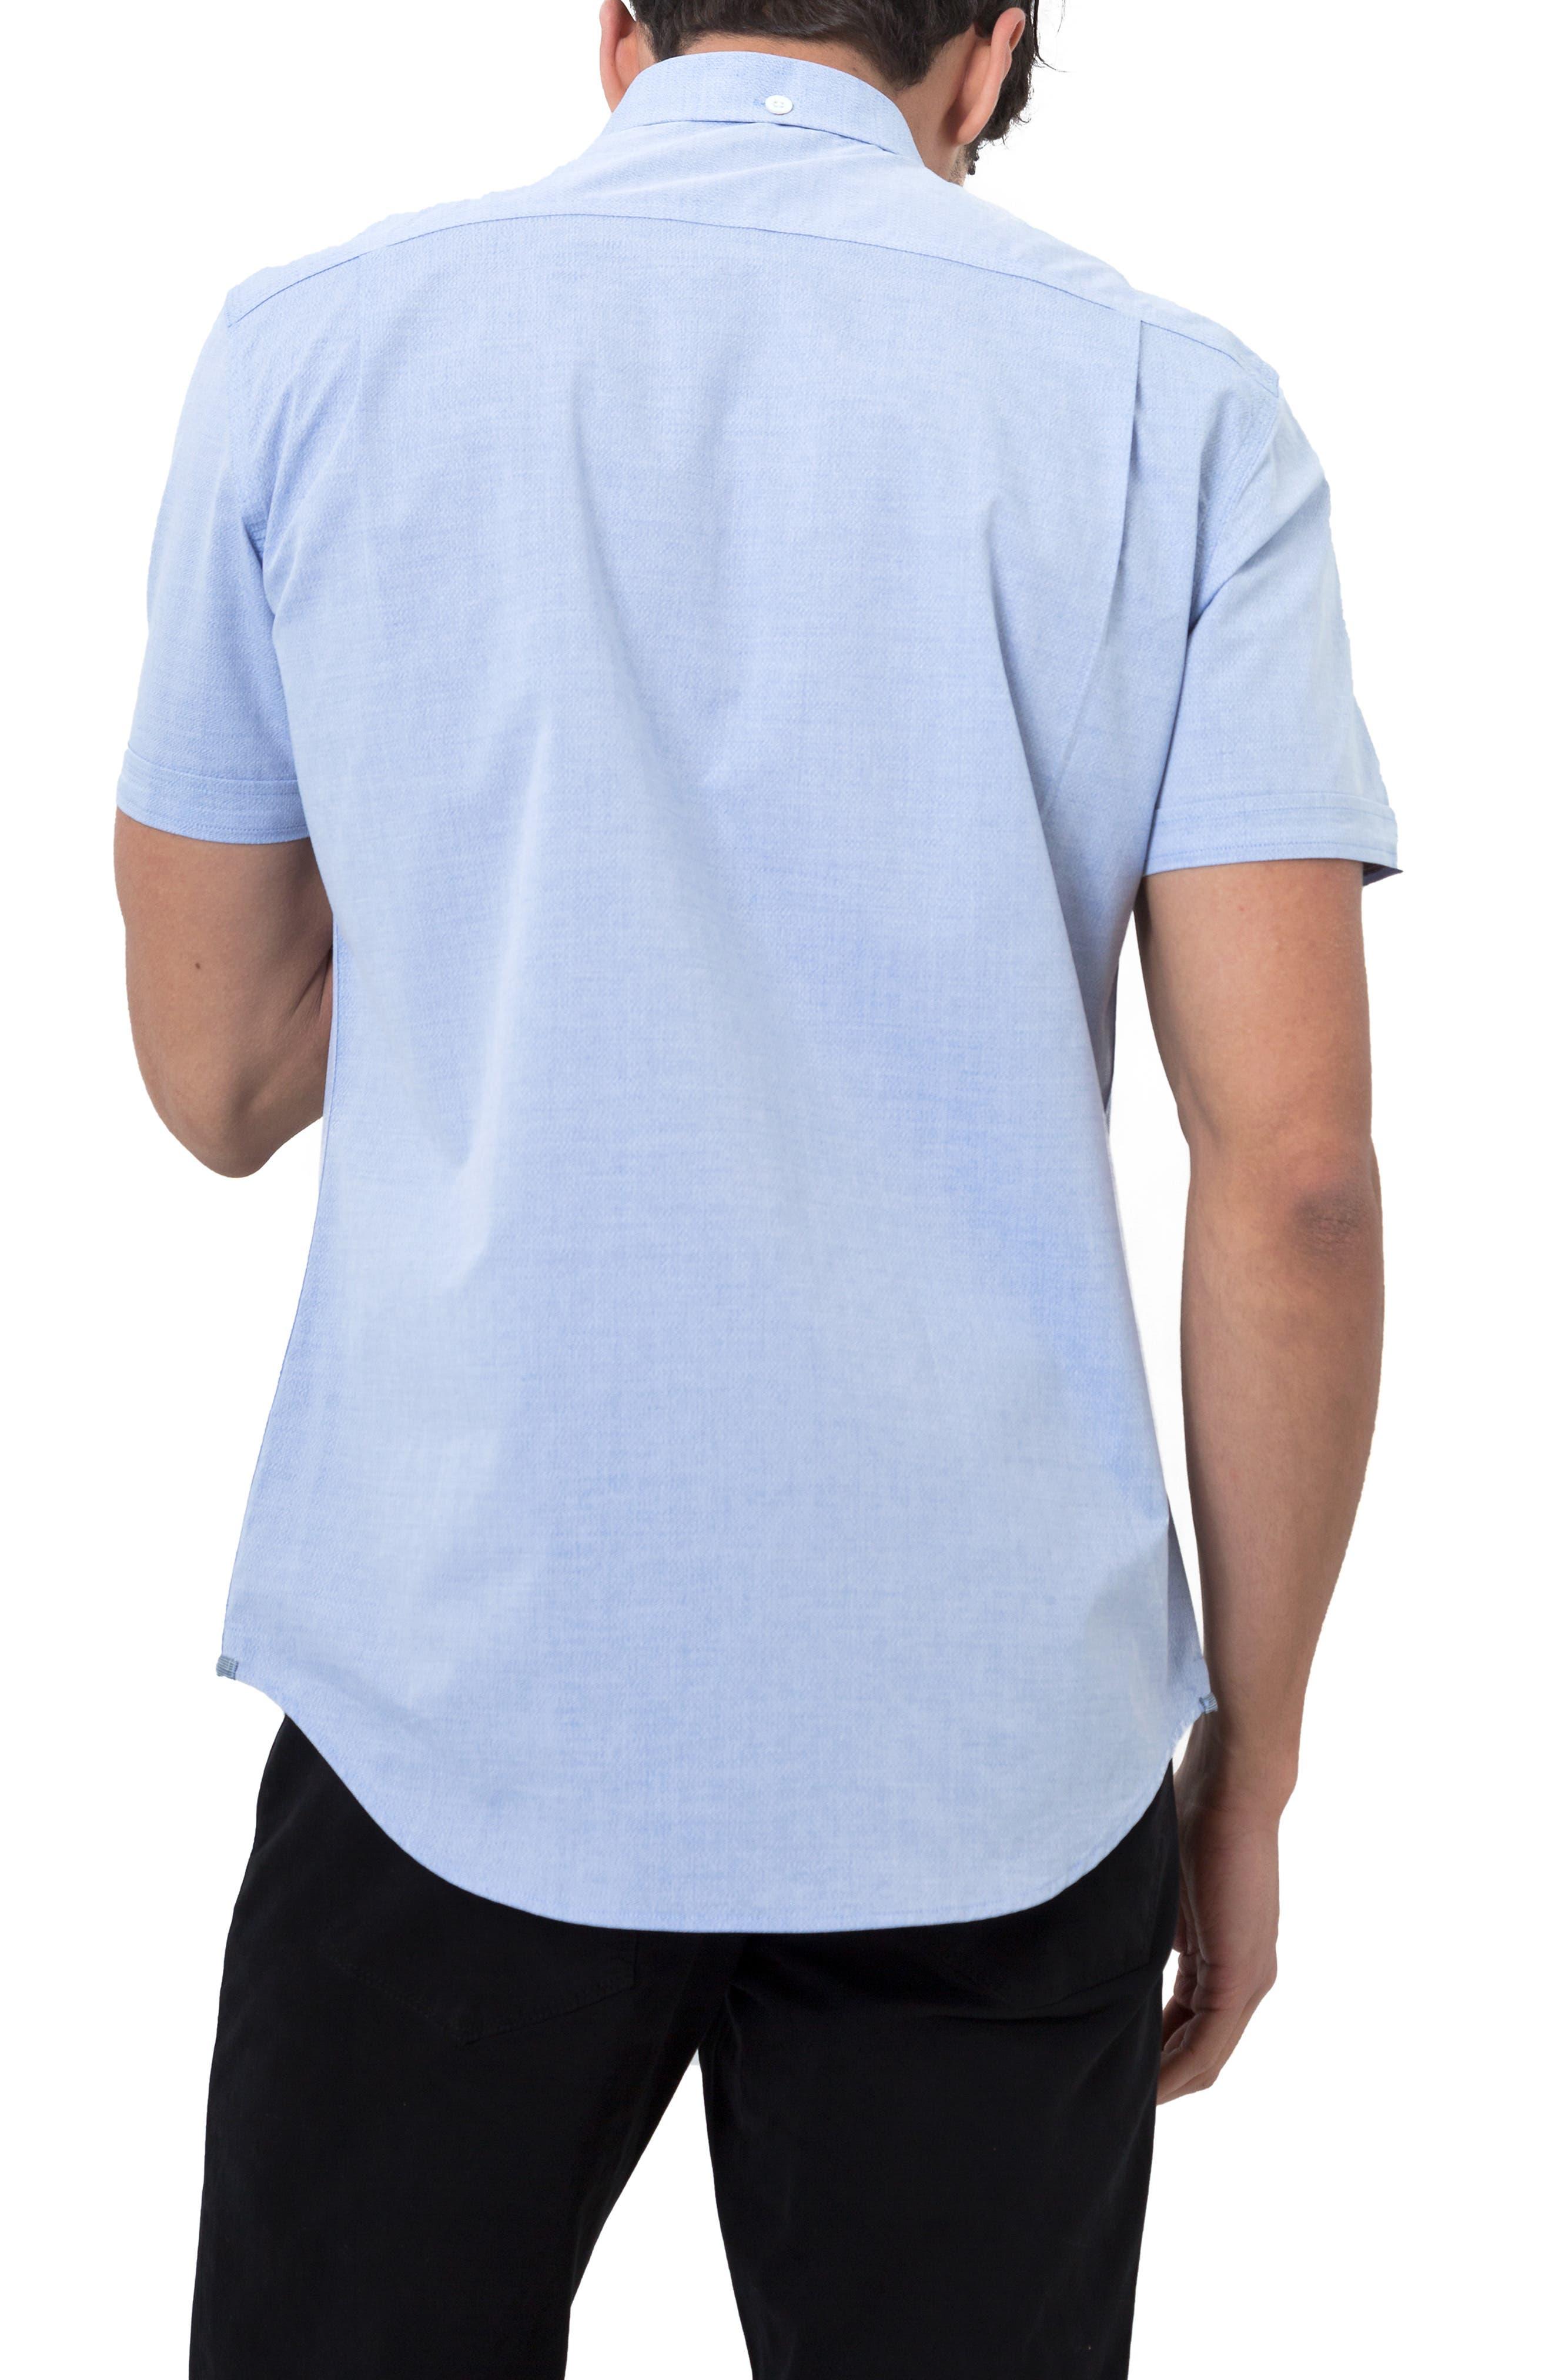 Smile Away Trim Fit Sport Shirt,                             Alternate thumbnail 3, color,                             LIGHT BLUE